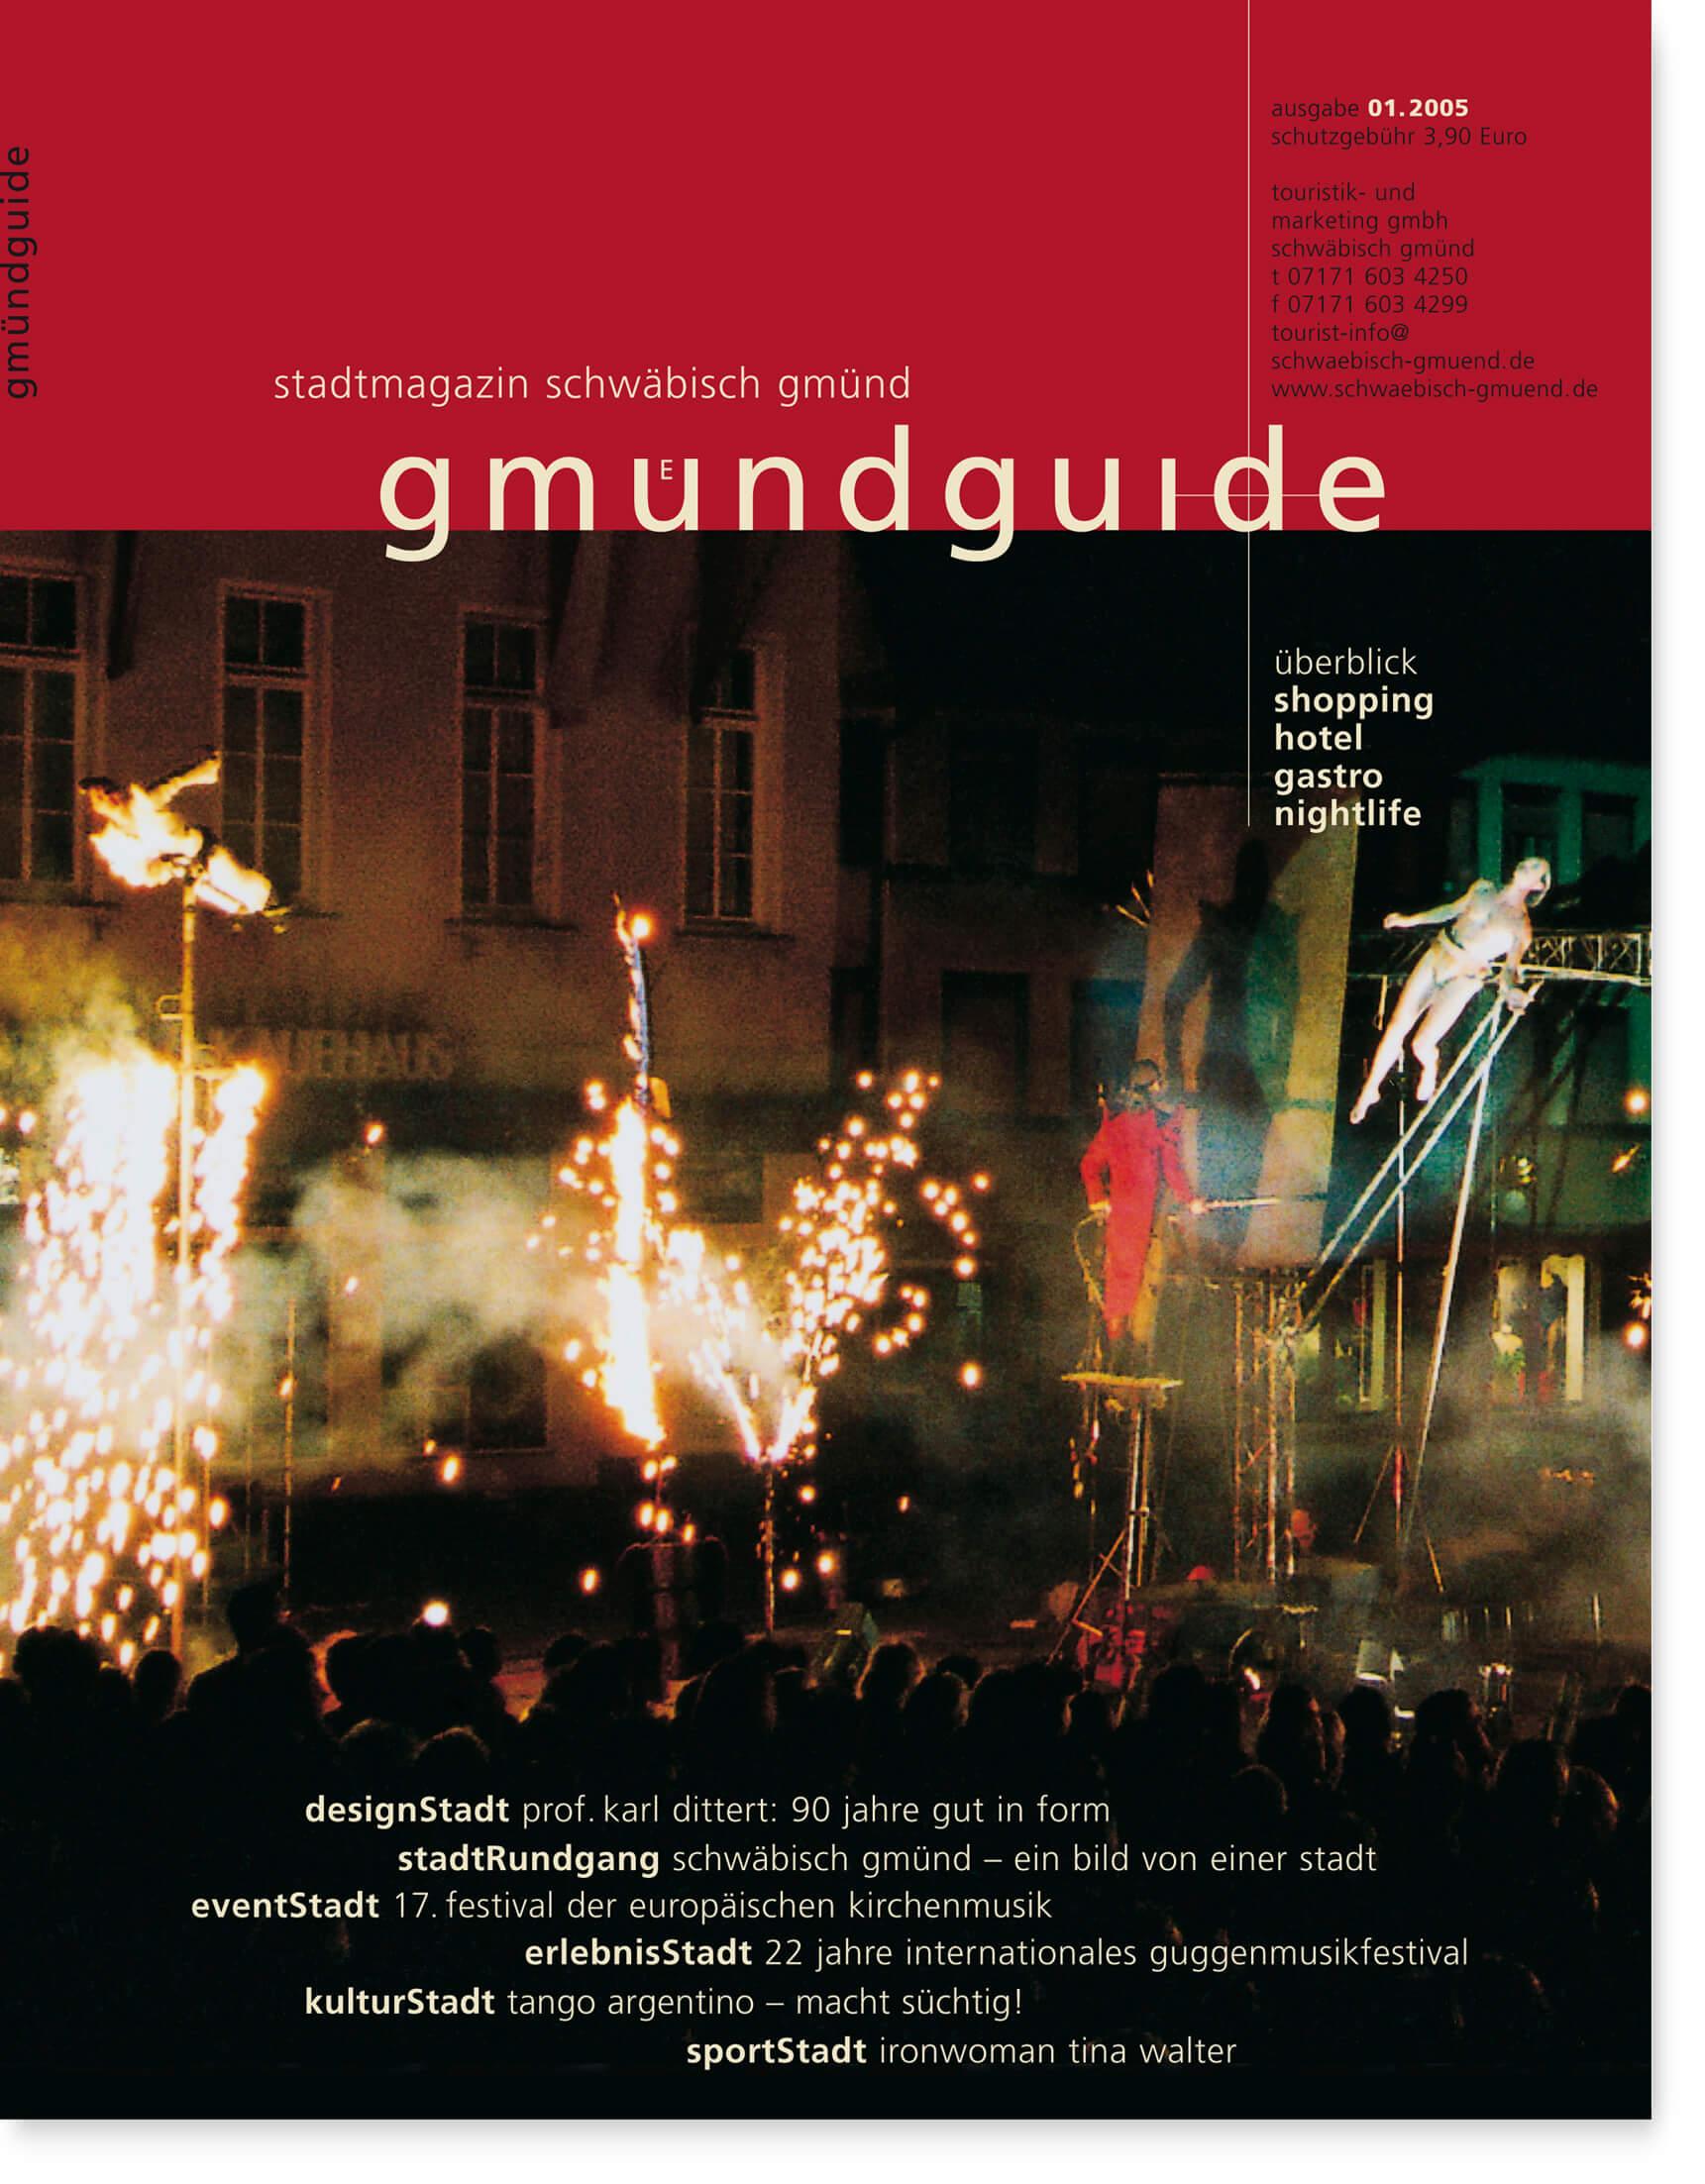 fh-web-gmuendguide-2005-1.jpg